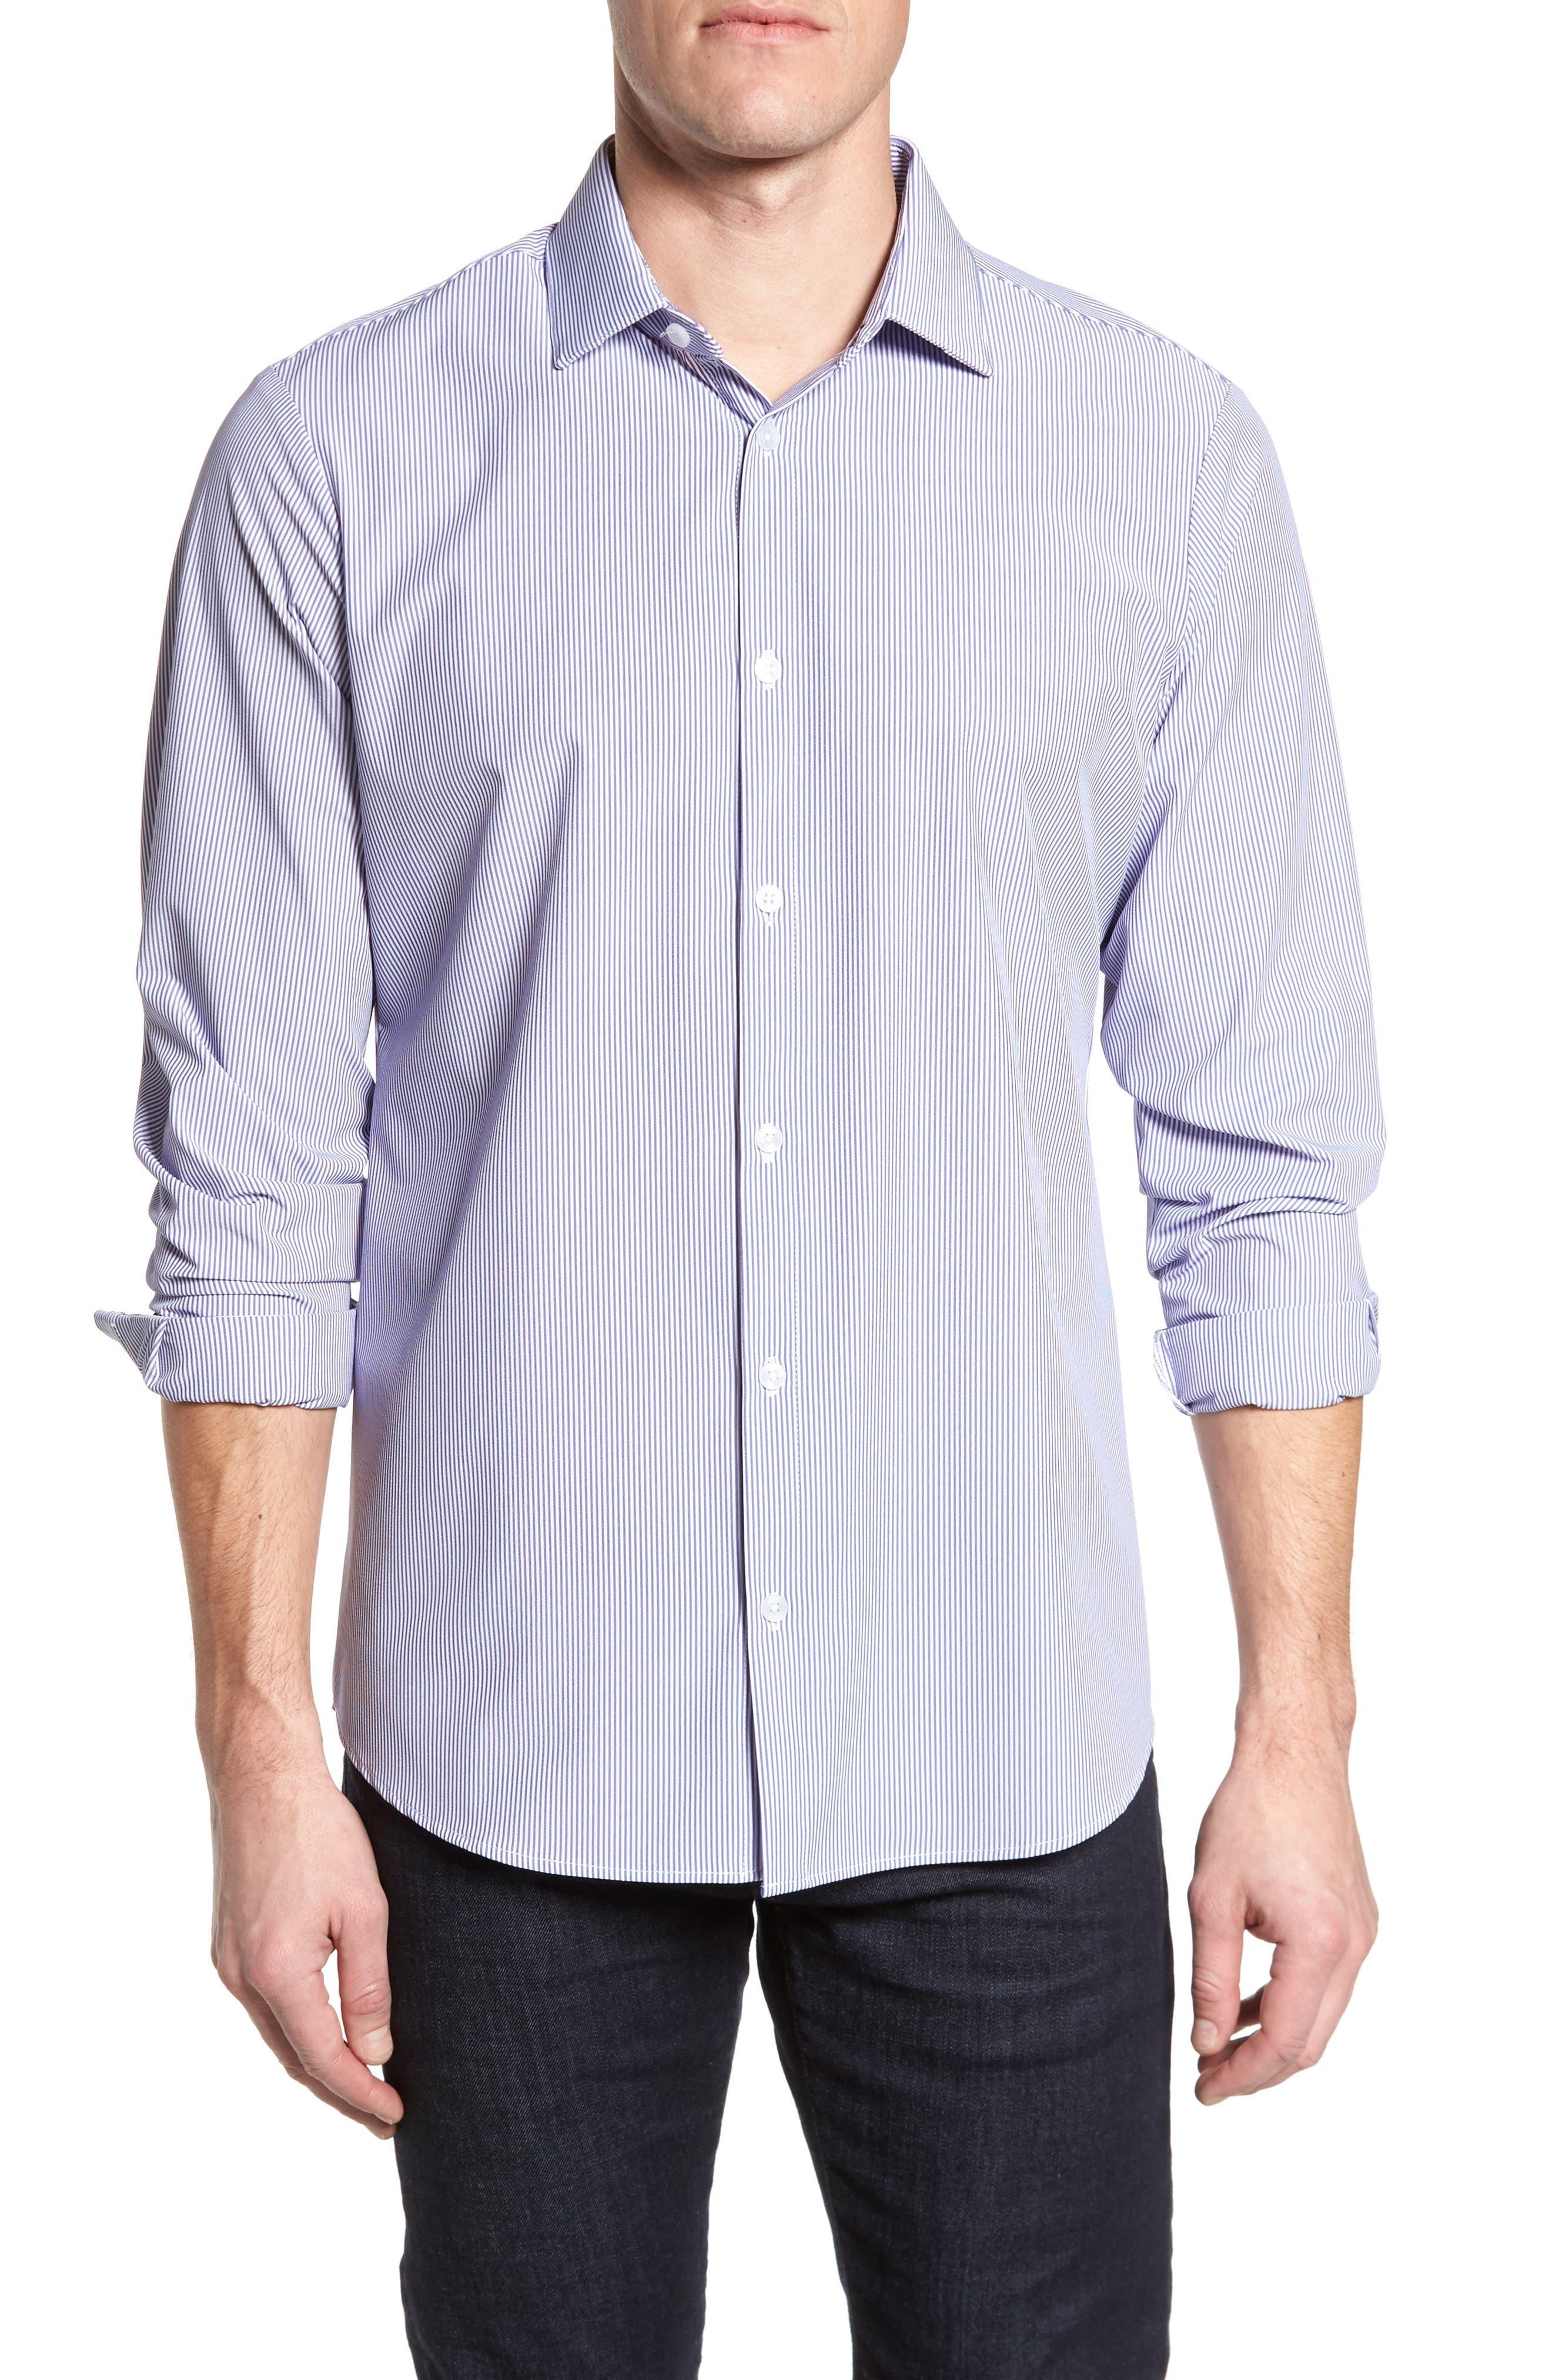 Newport Pinstripe Sport Shirt,                             Main thumbnail 1, color,                             Blue